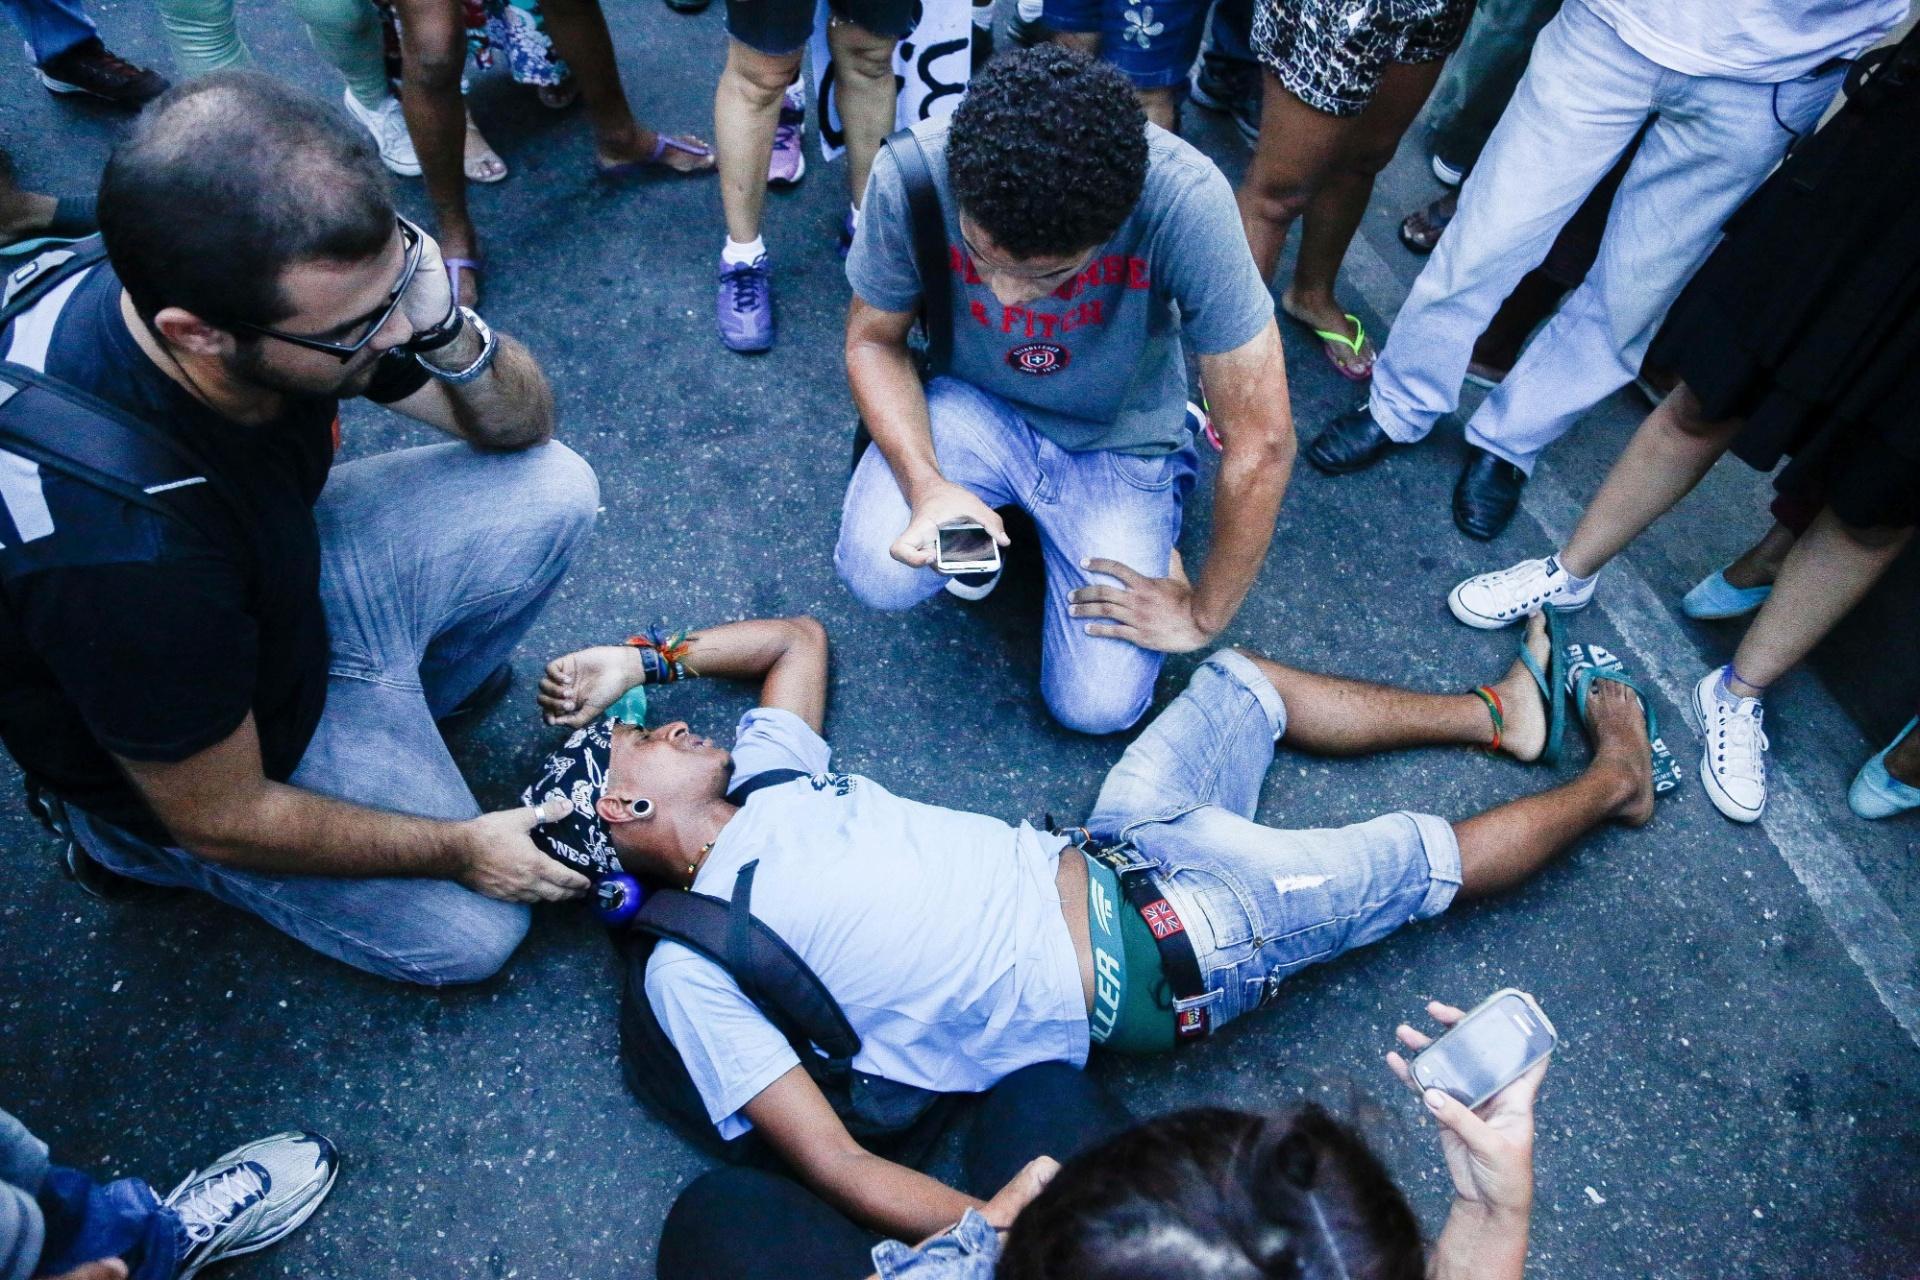 167c9edde451d 30.jan.2015 - Manifestantes acodem colega desacordado durante passeata  contra o aumento das